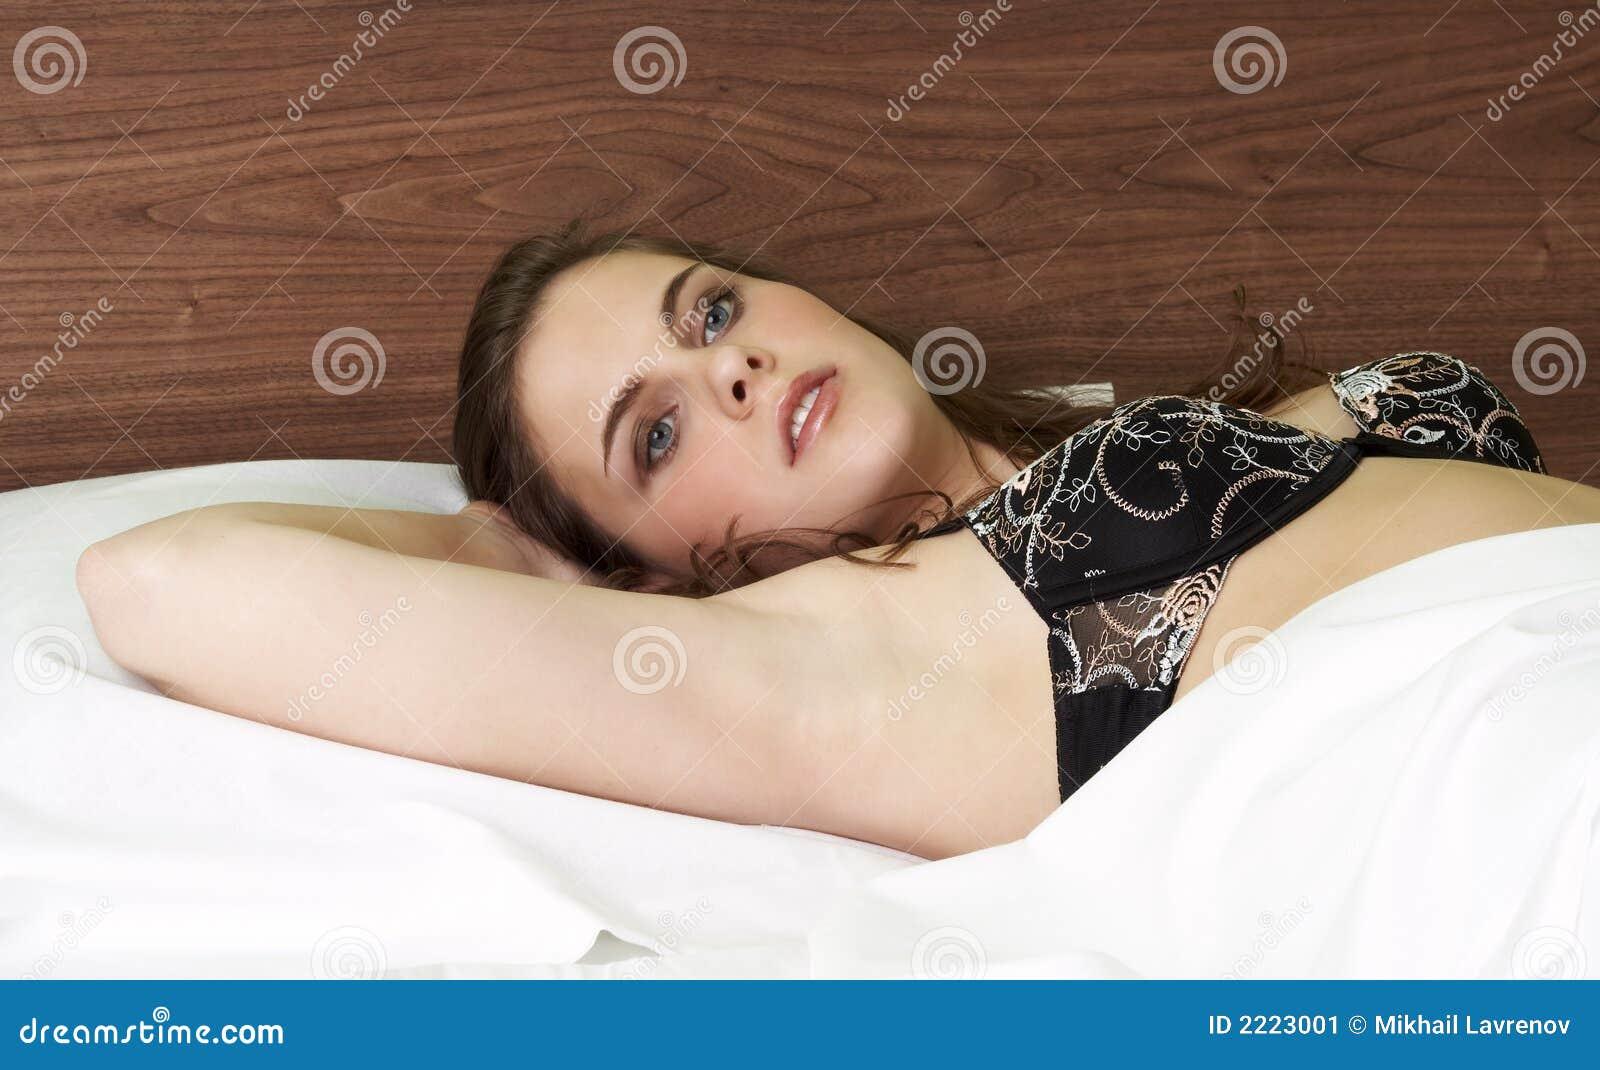 pretty girl in bed stock image image 2223001. Black Bedroom Furniture Sets. Home Design Ideas